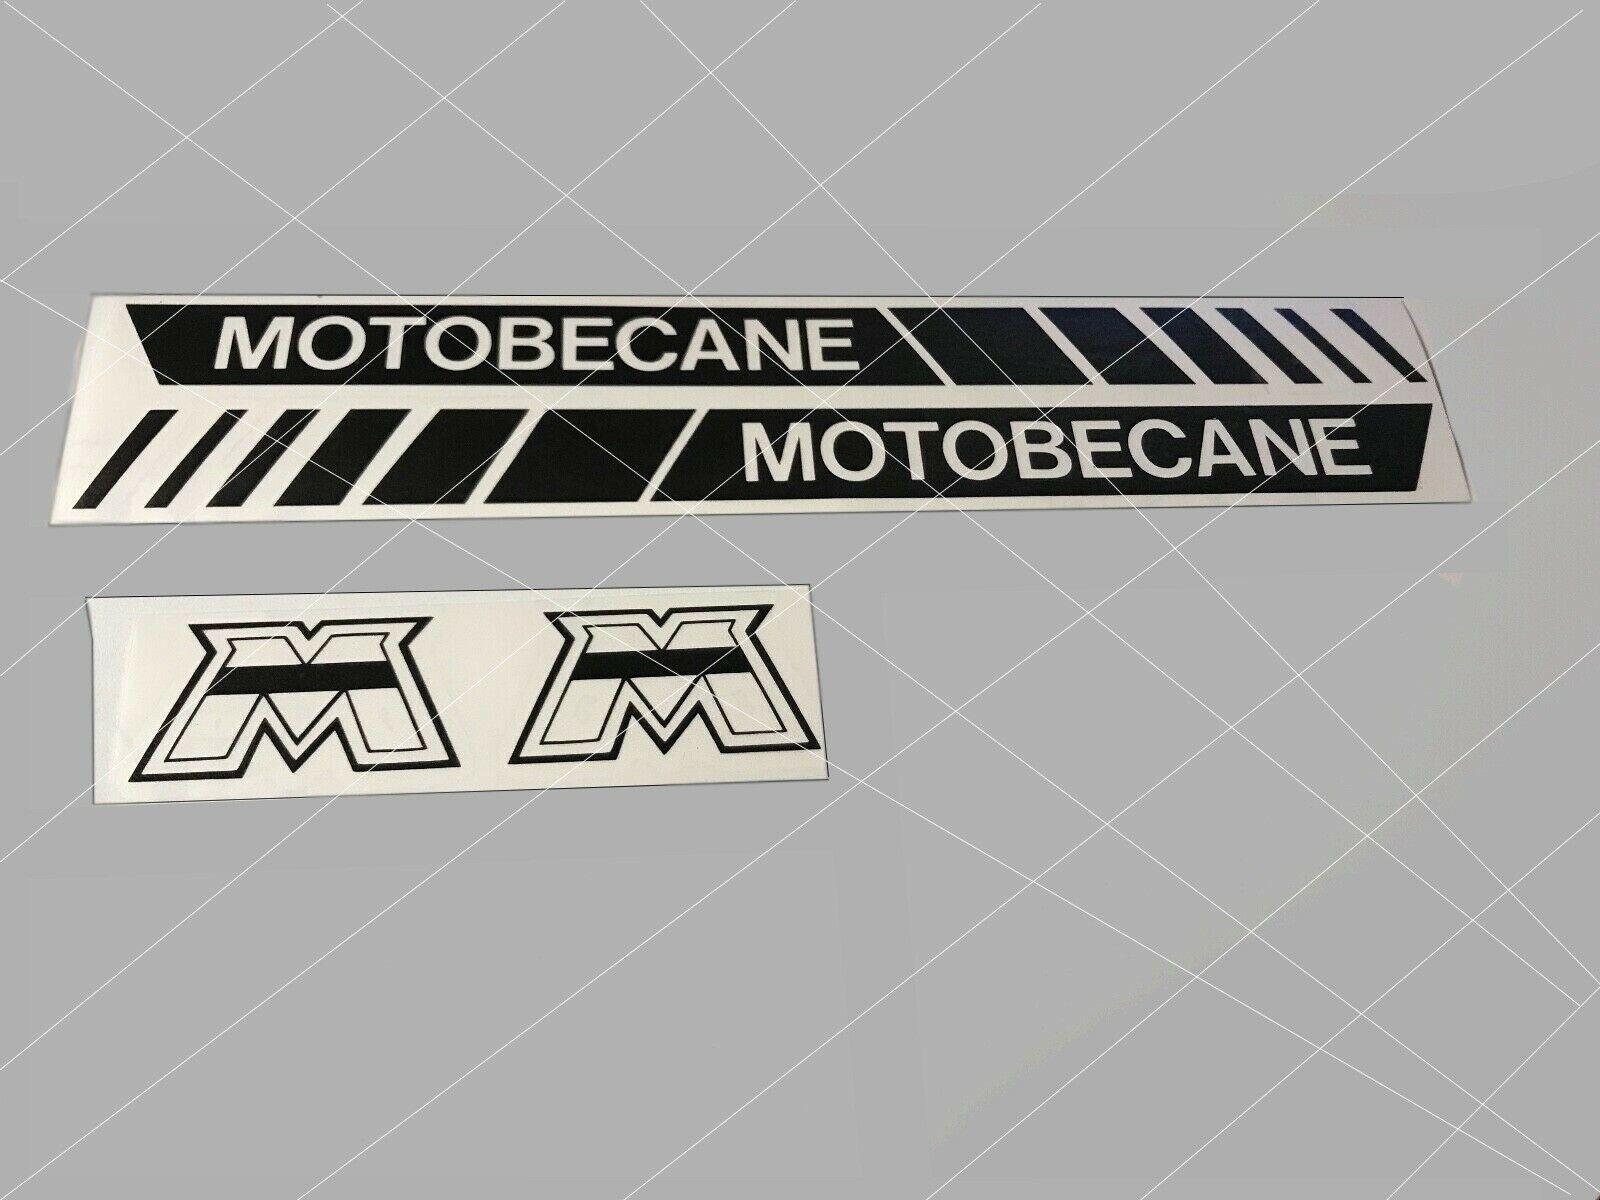 AUTOCOLLANTS CADRE RESERVOIR MOTOBECANE+M .MOTOBECANE Mbk 51 motobecane